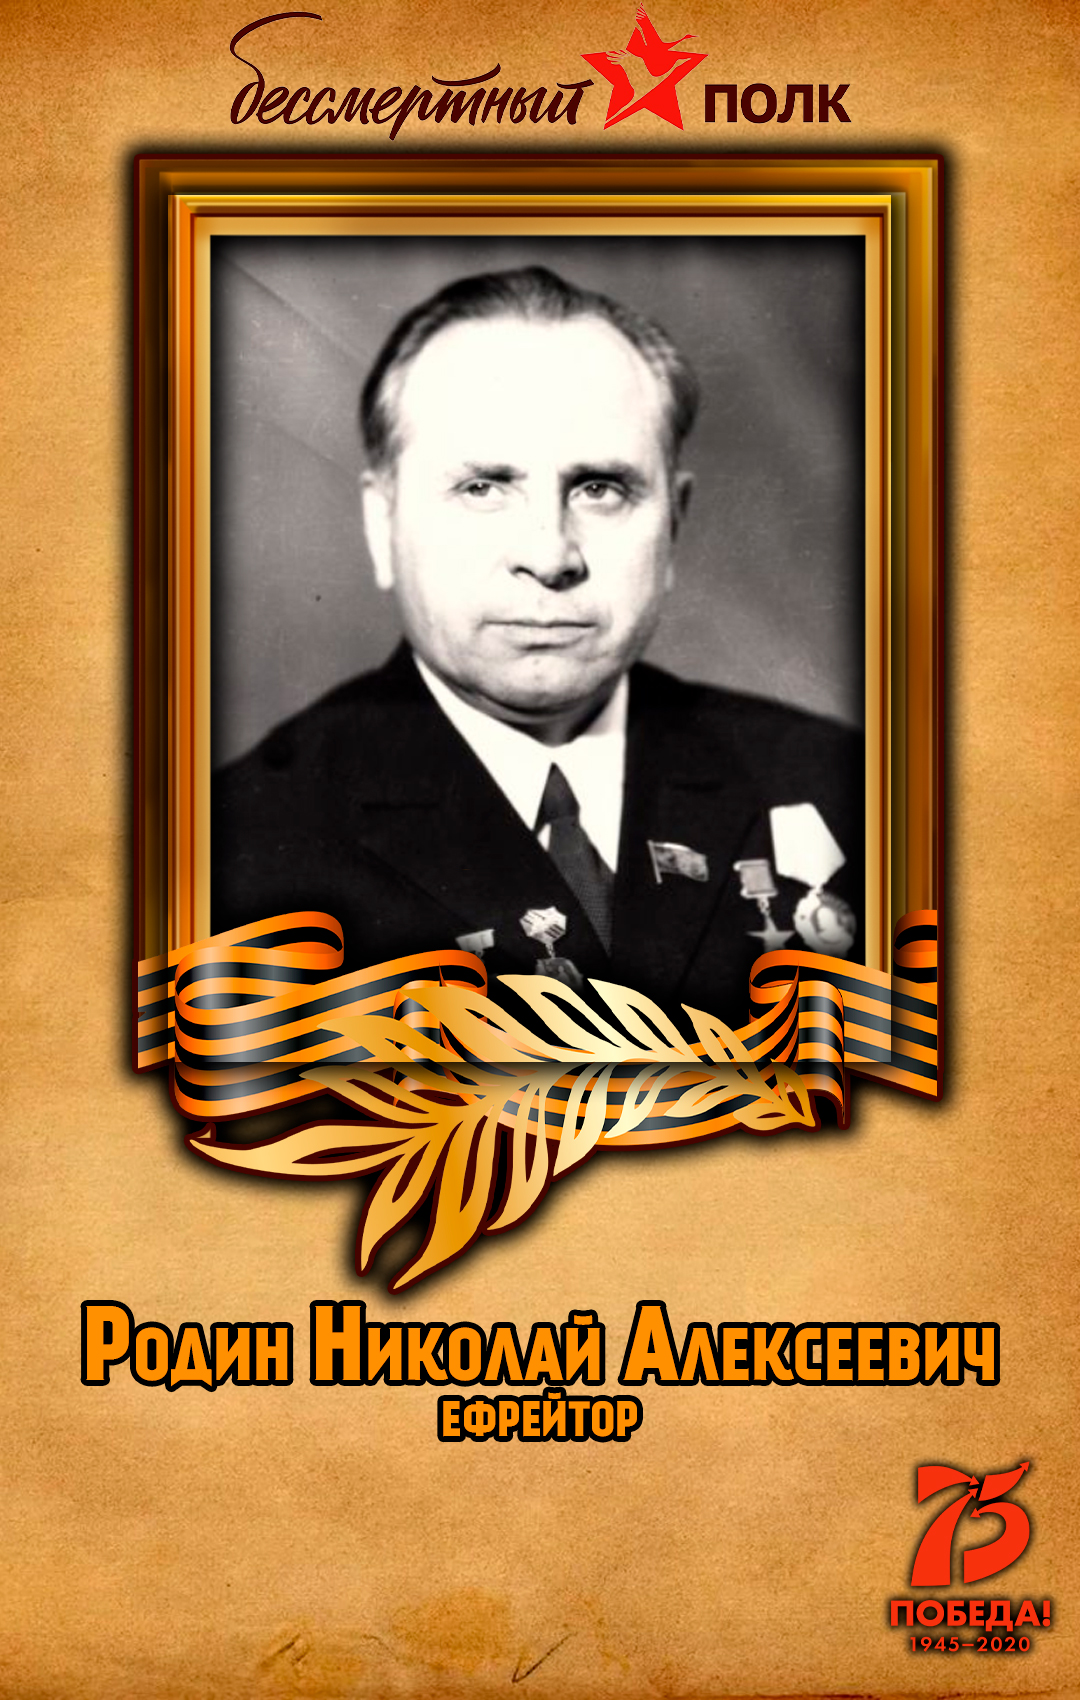 Родин-Николай-Алексеевич